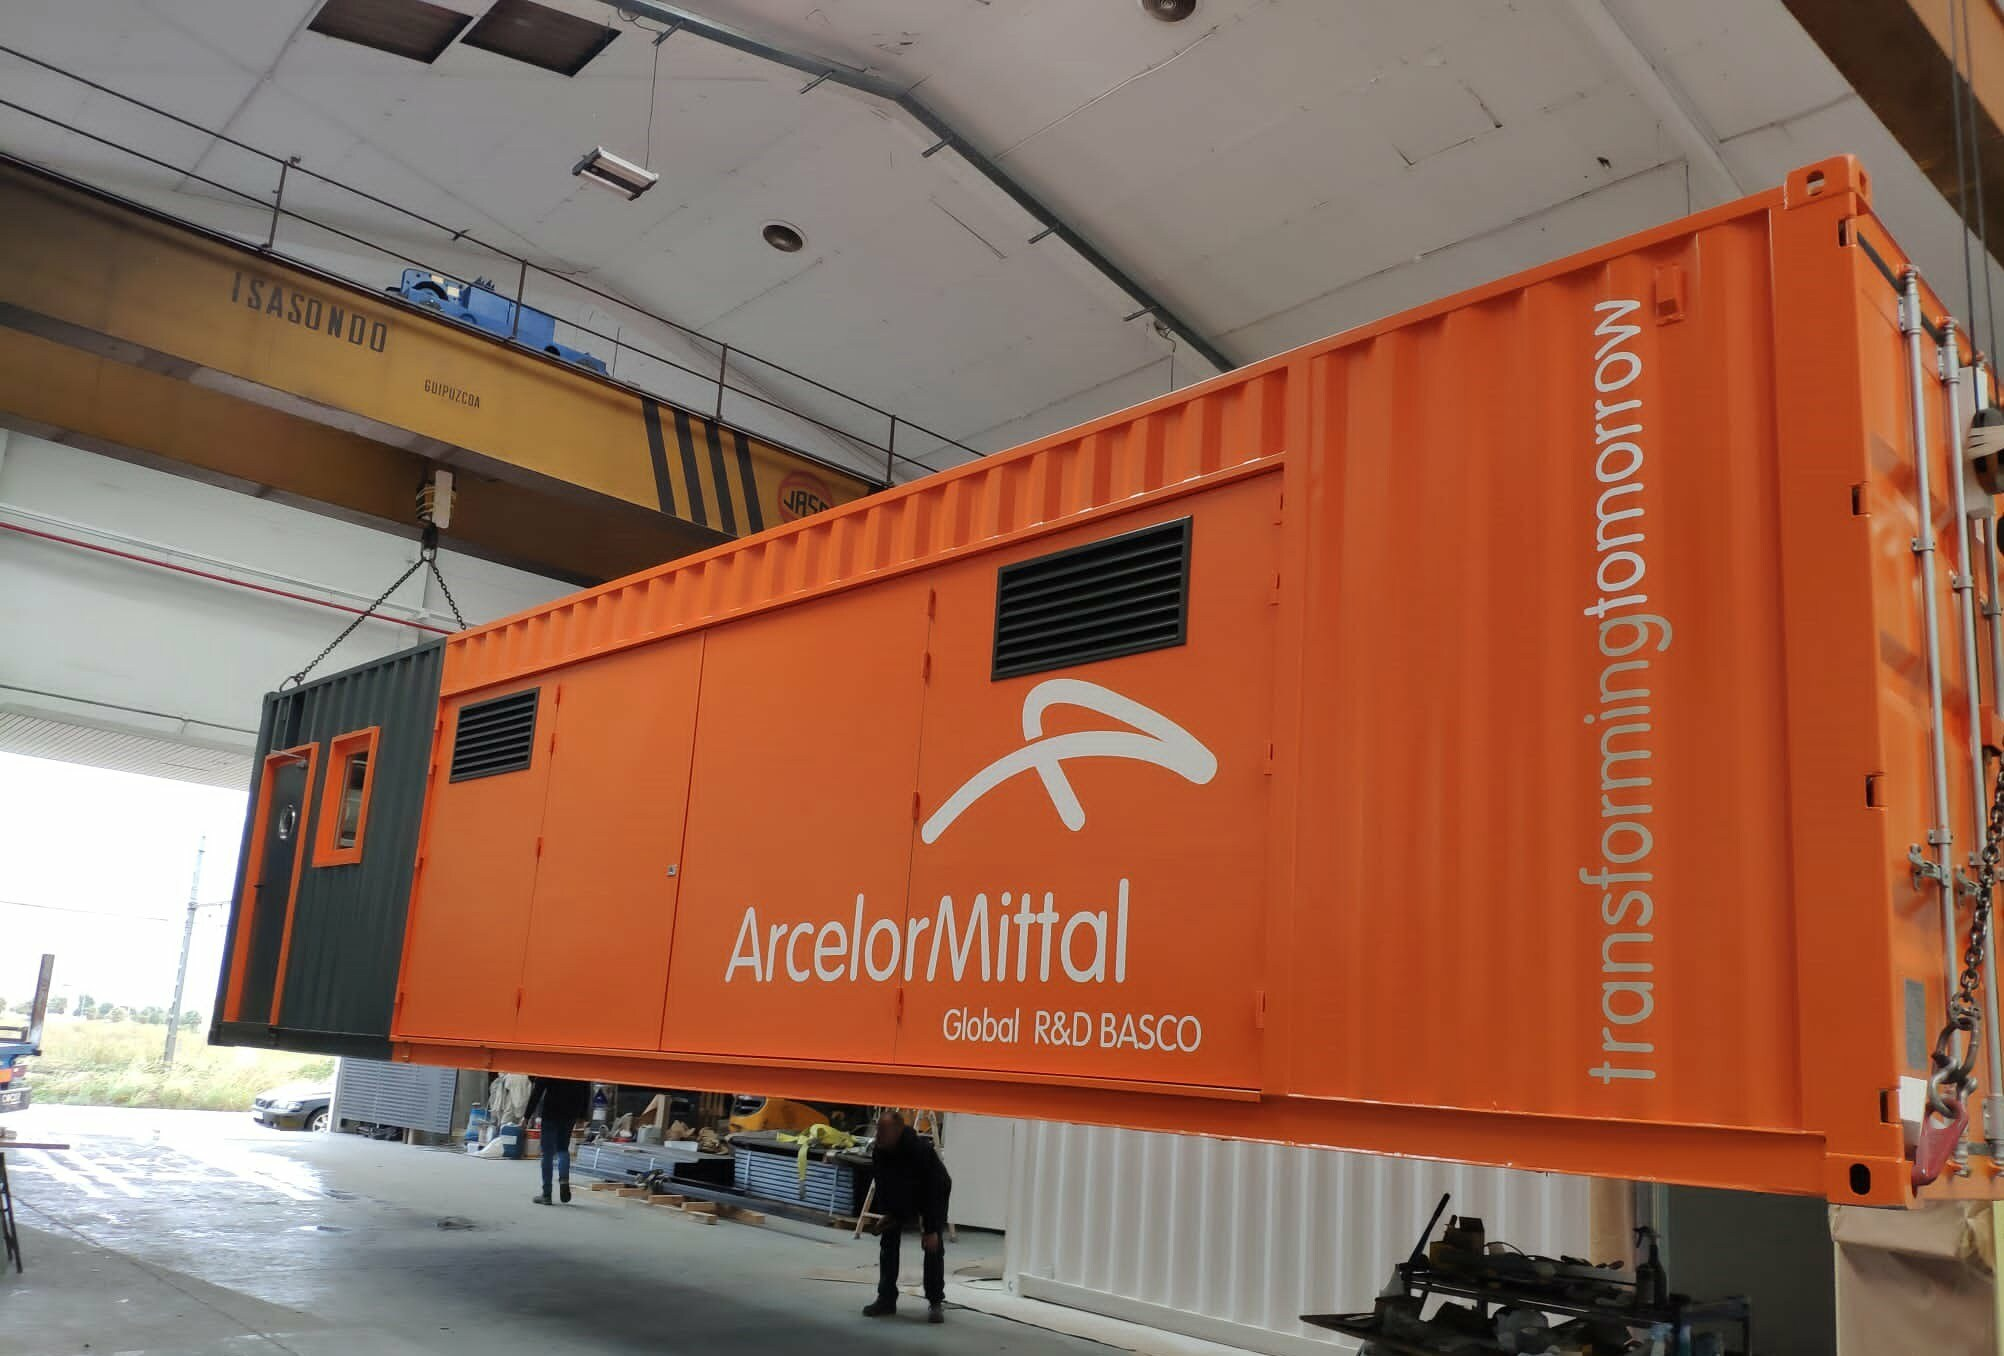 proyecto ARCELOR en contenedores maritimos - Projects